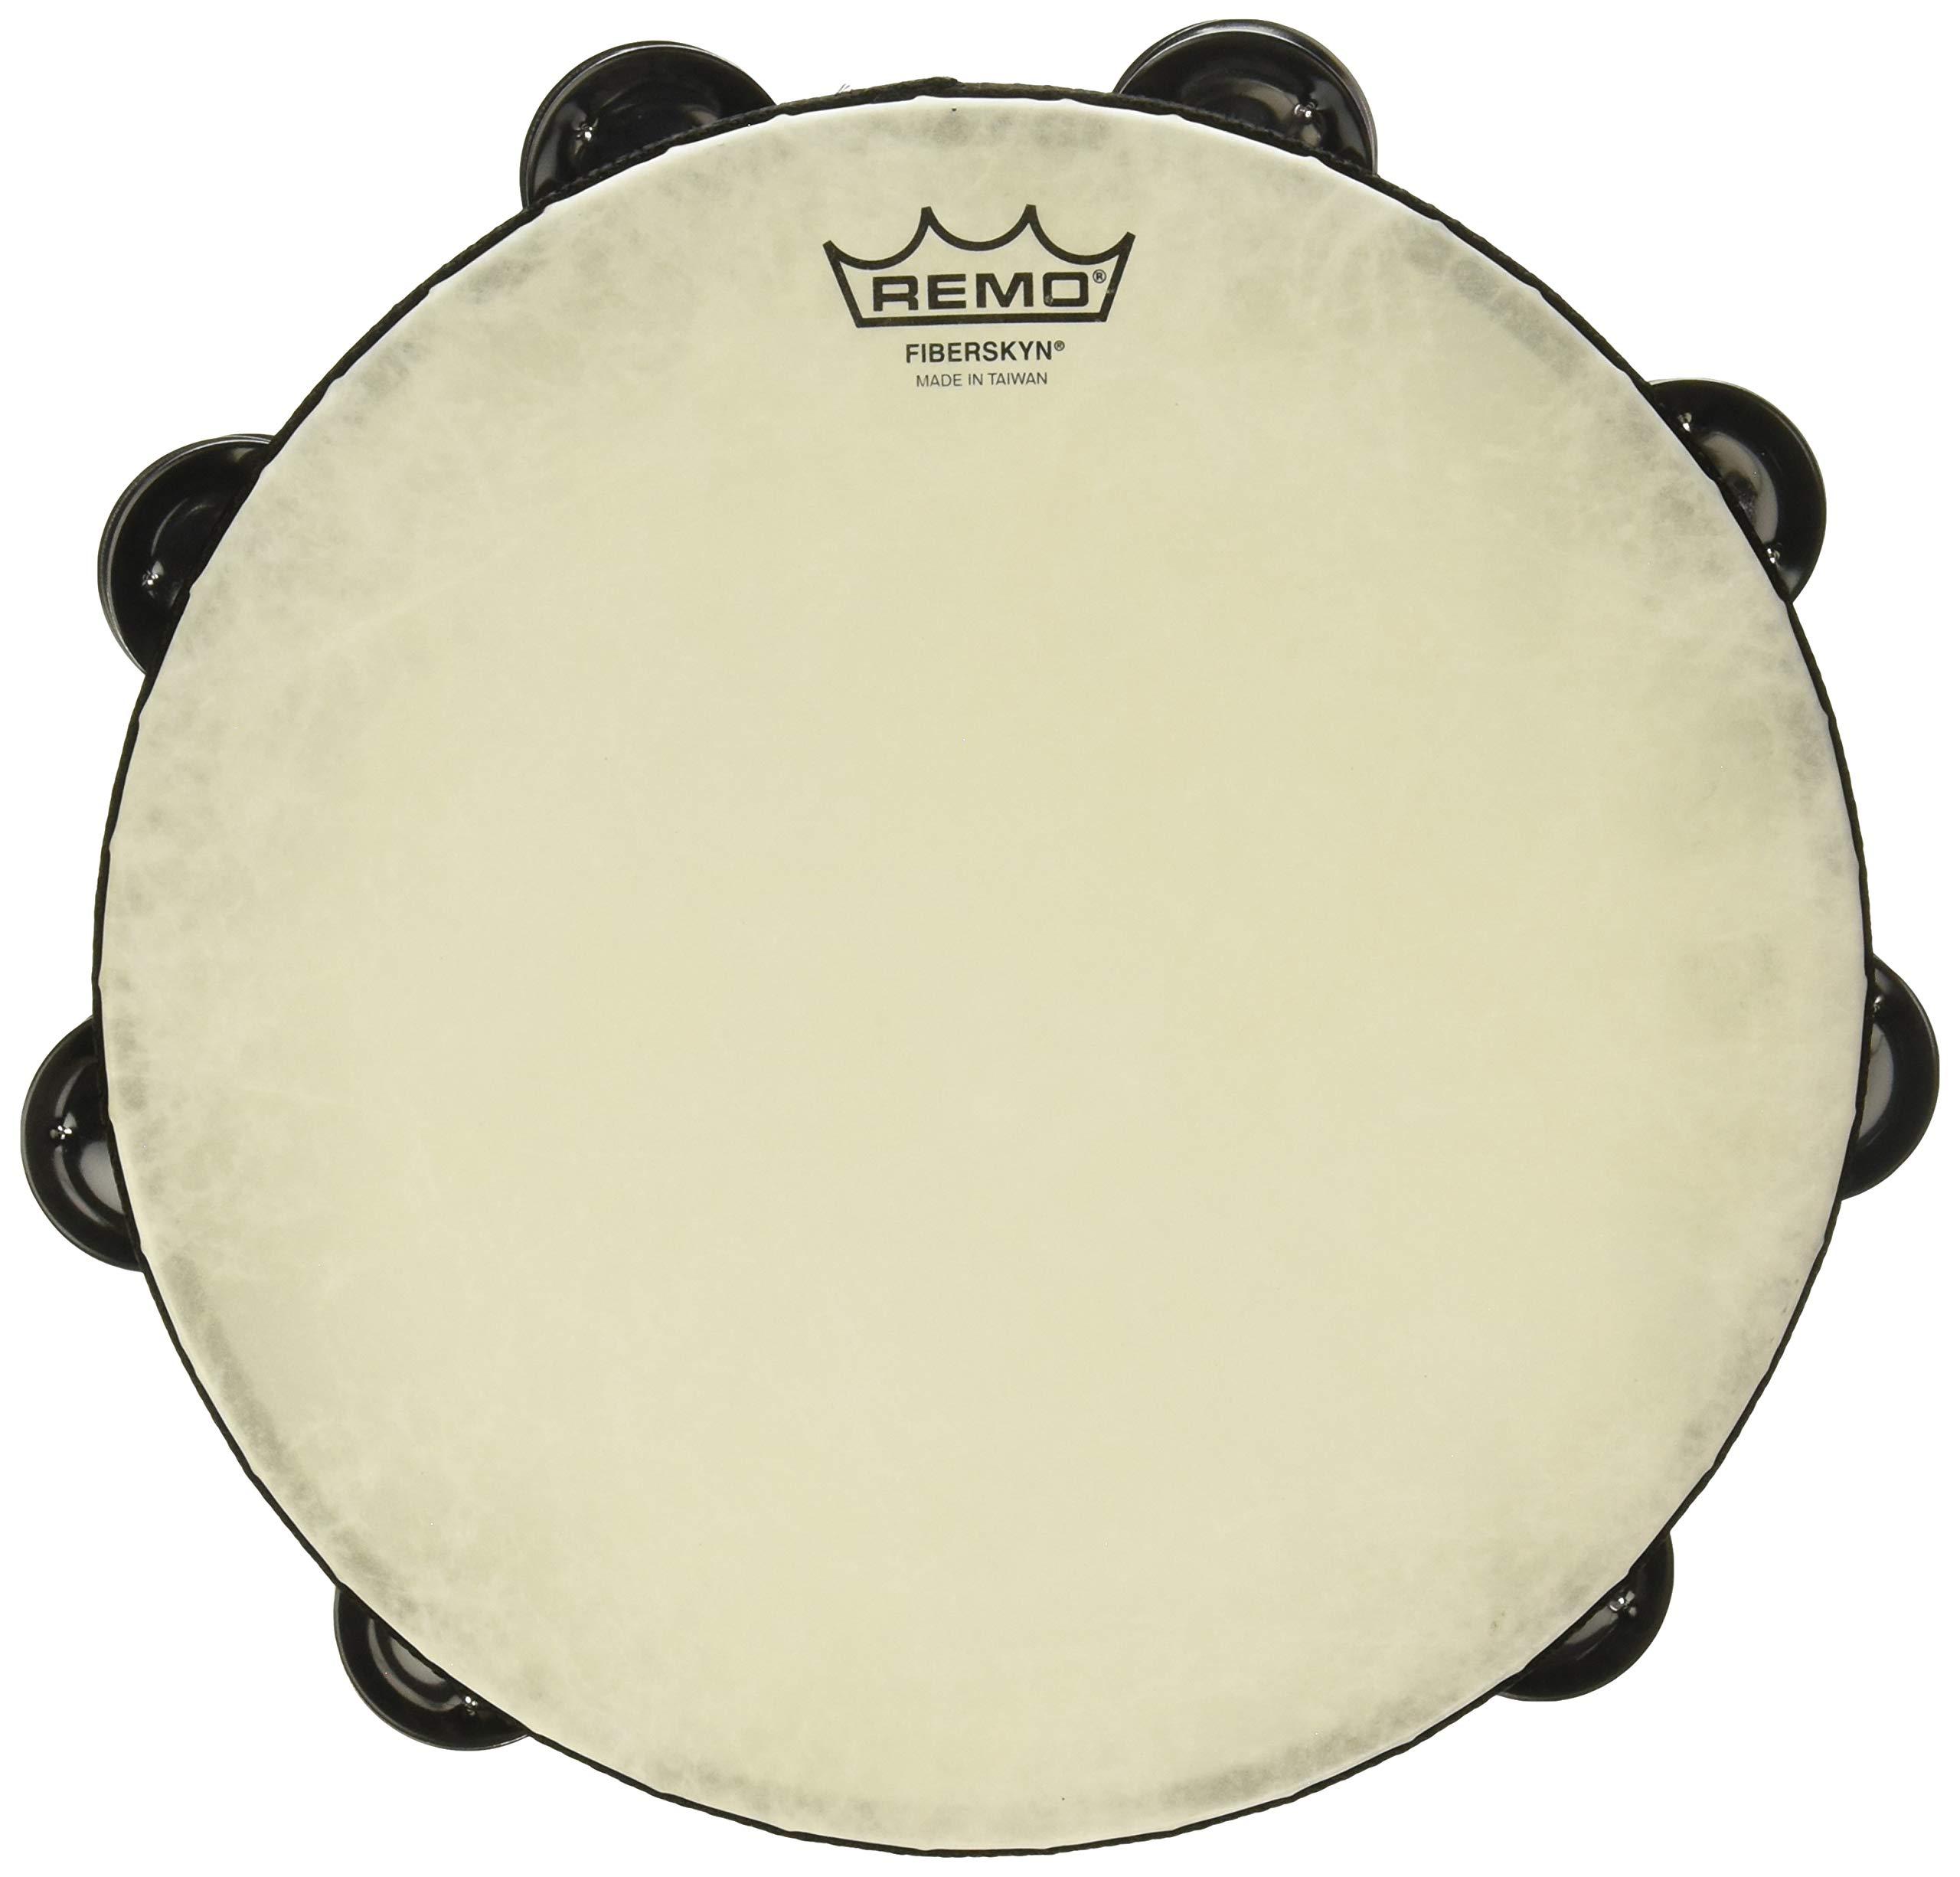 Remo Fixed-Head Tambourine Black 10 in. by Remo